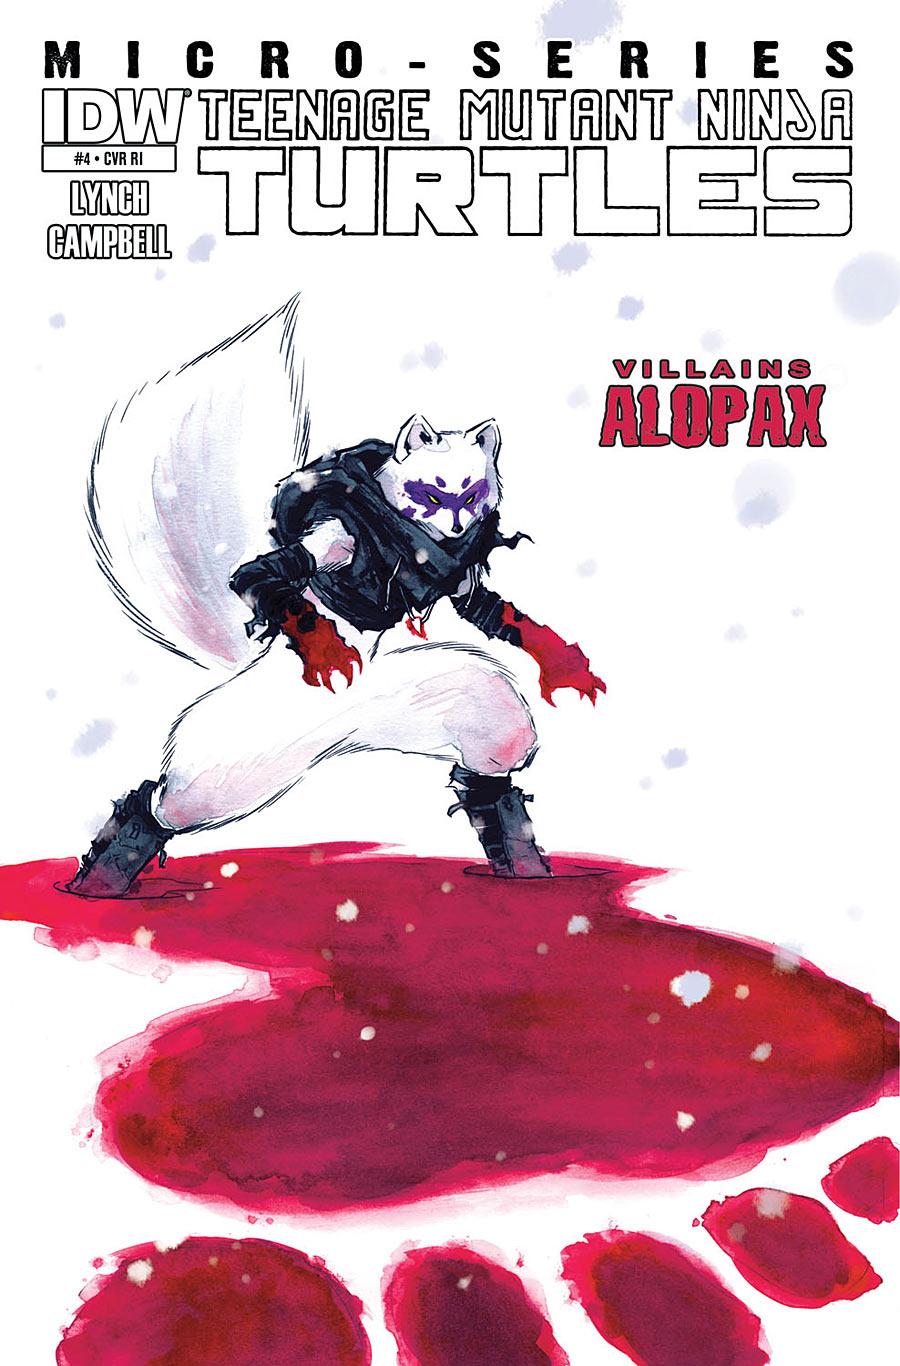 Villain Micro-series #4: Alopex